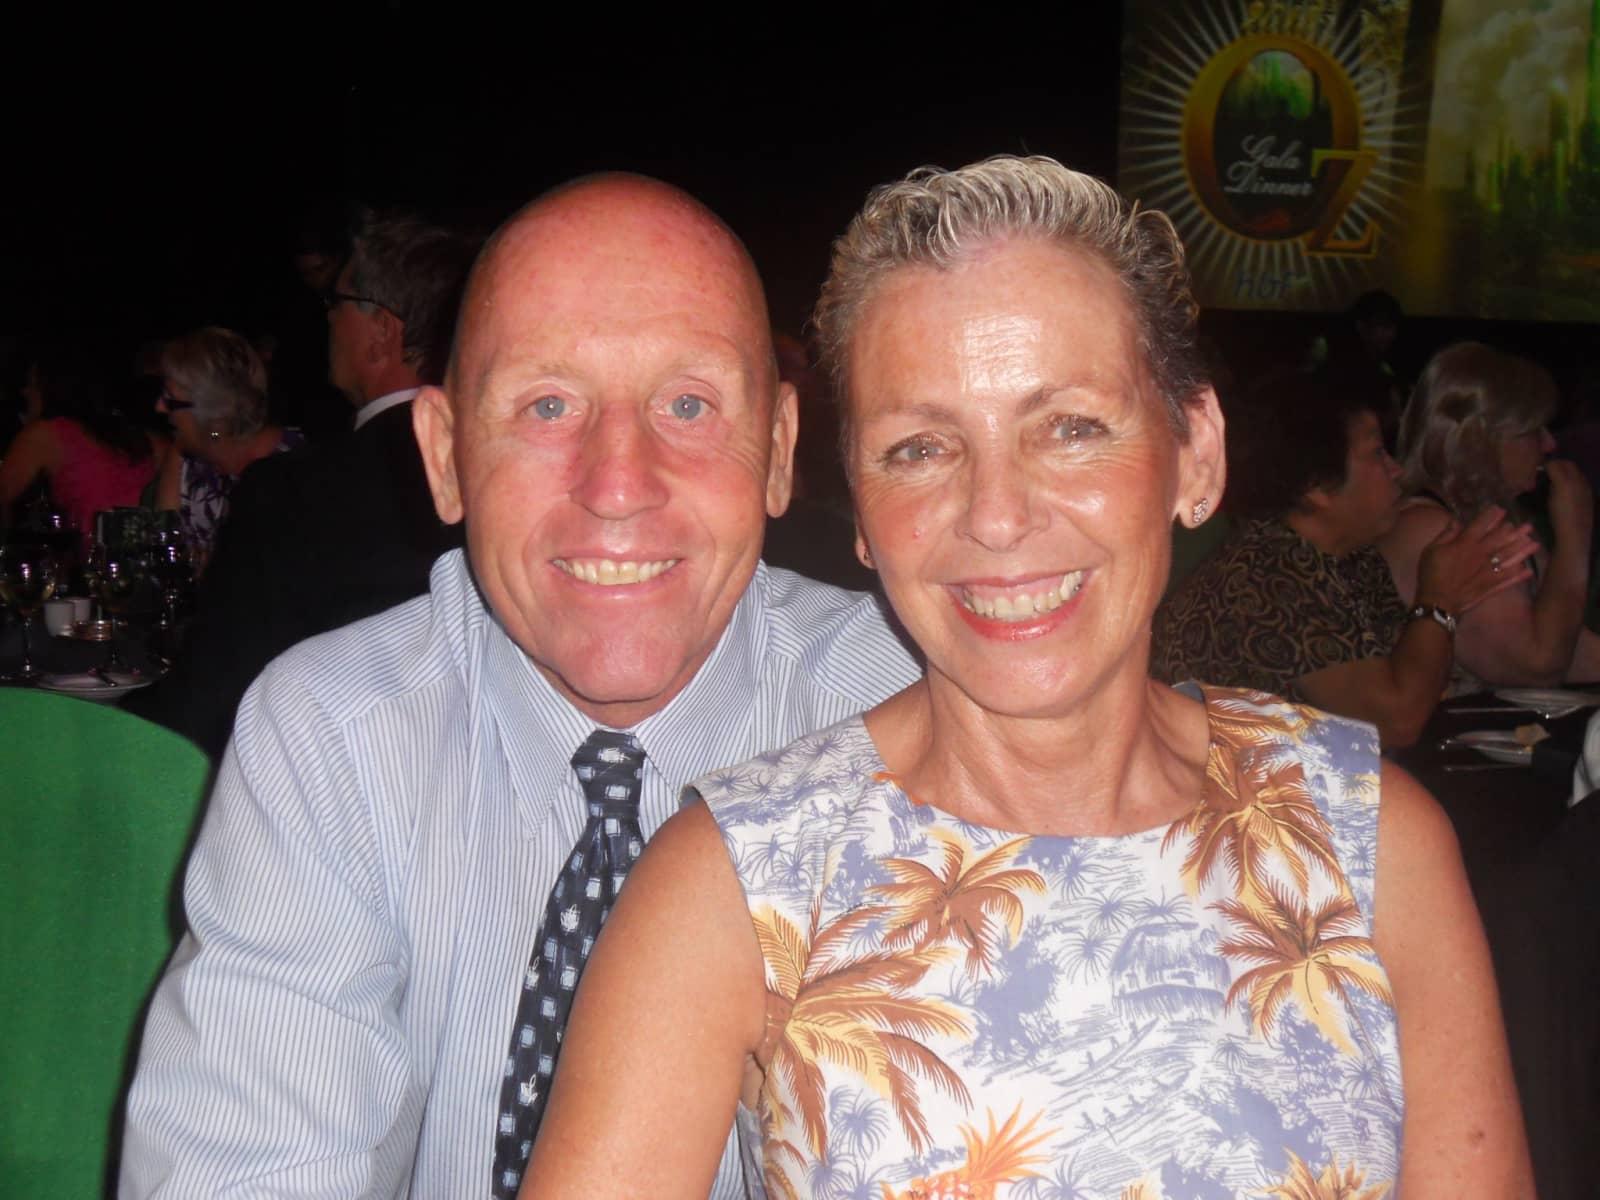 Dave & Lizzie from Perth, Western Australia, Australia